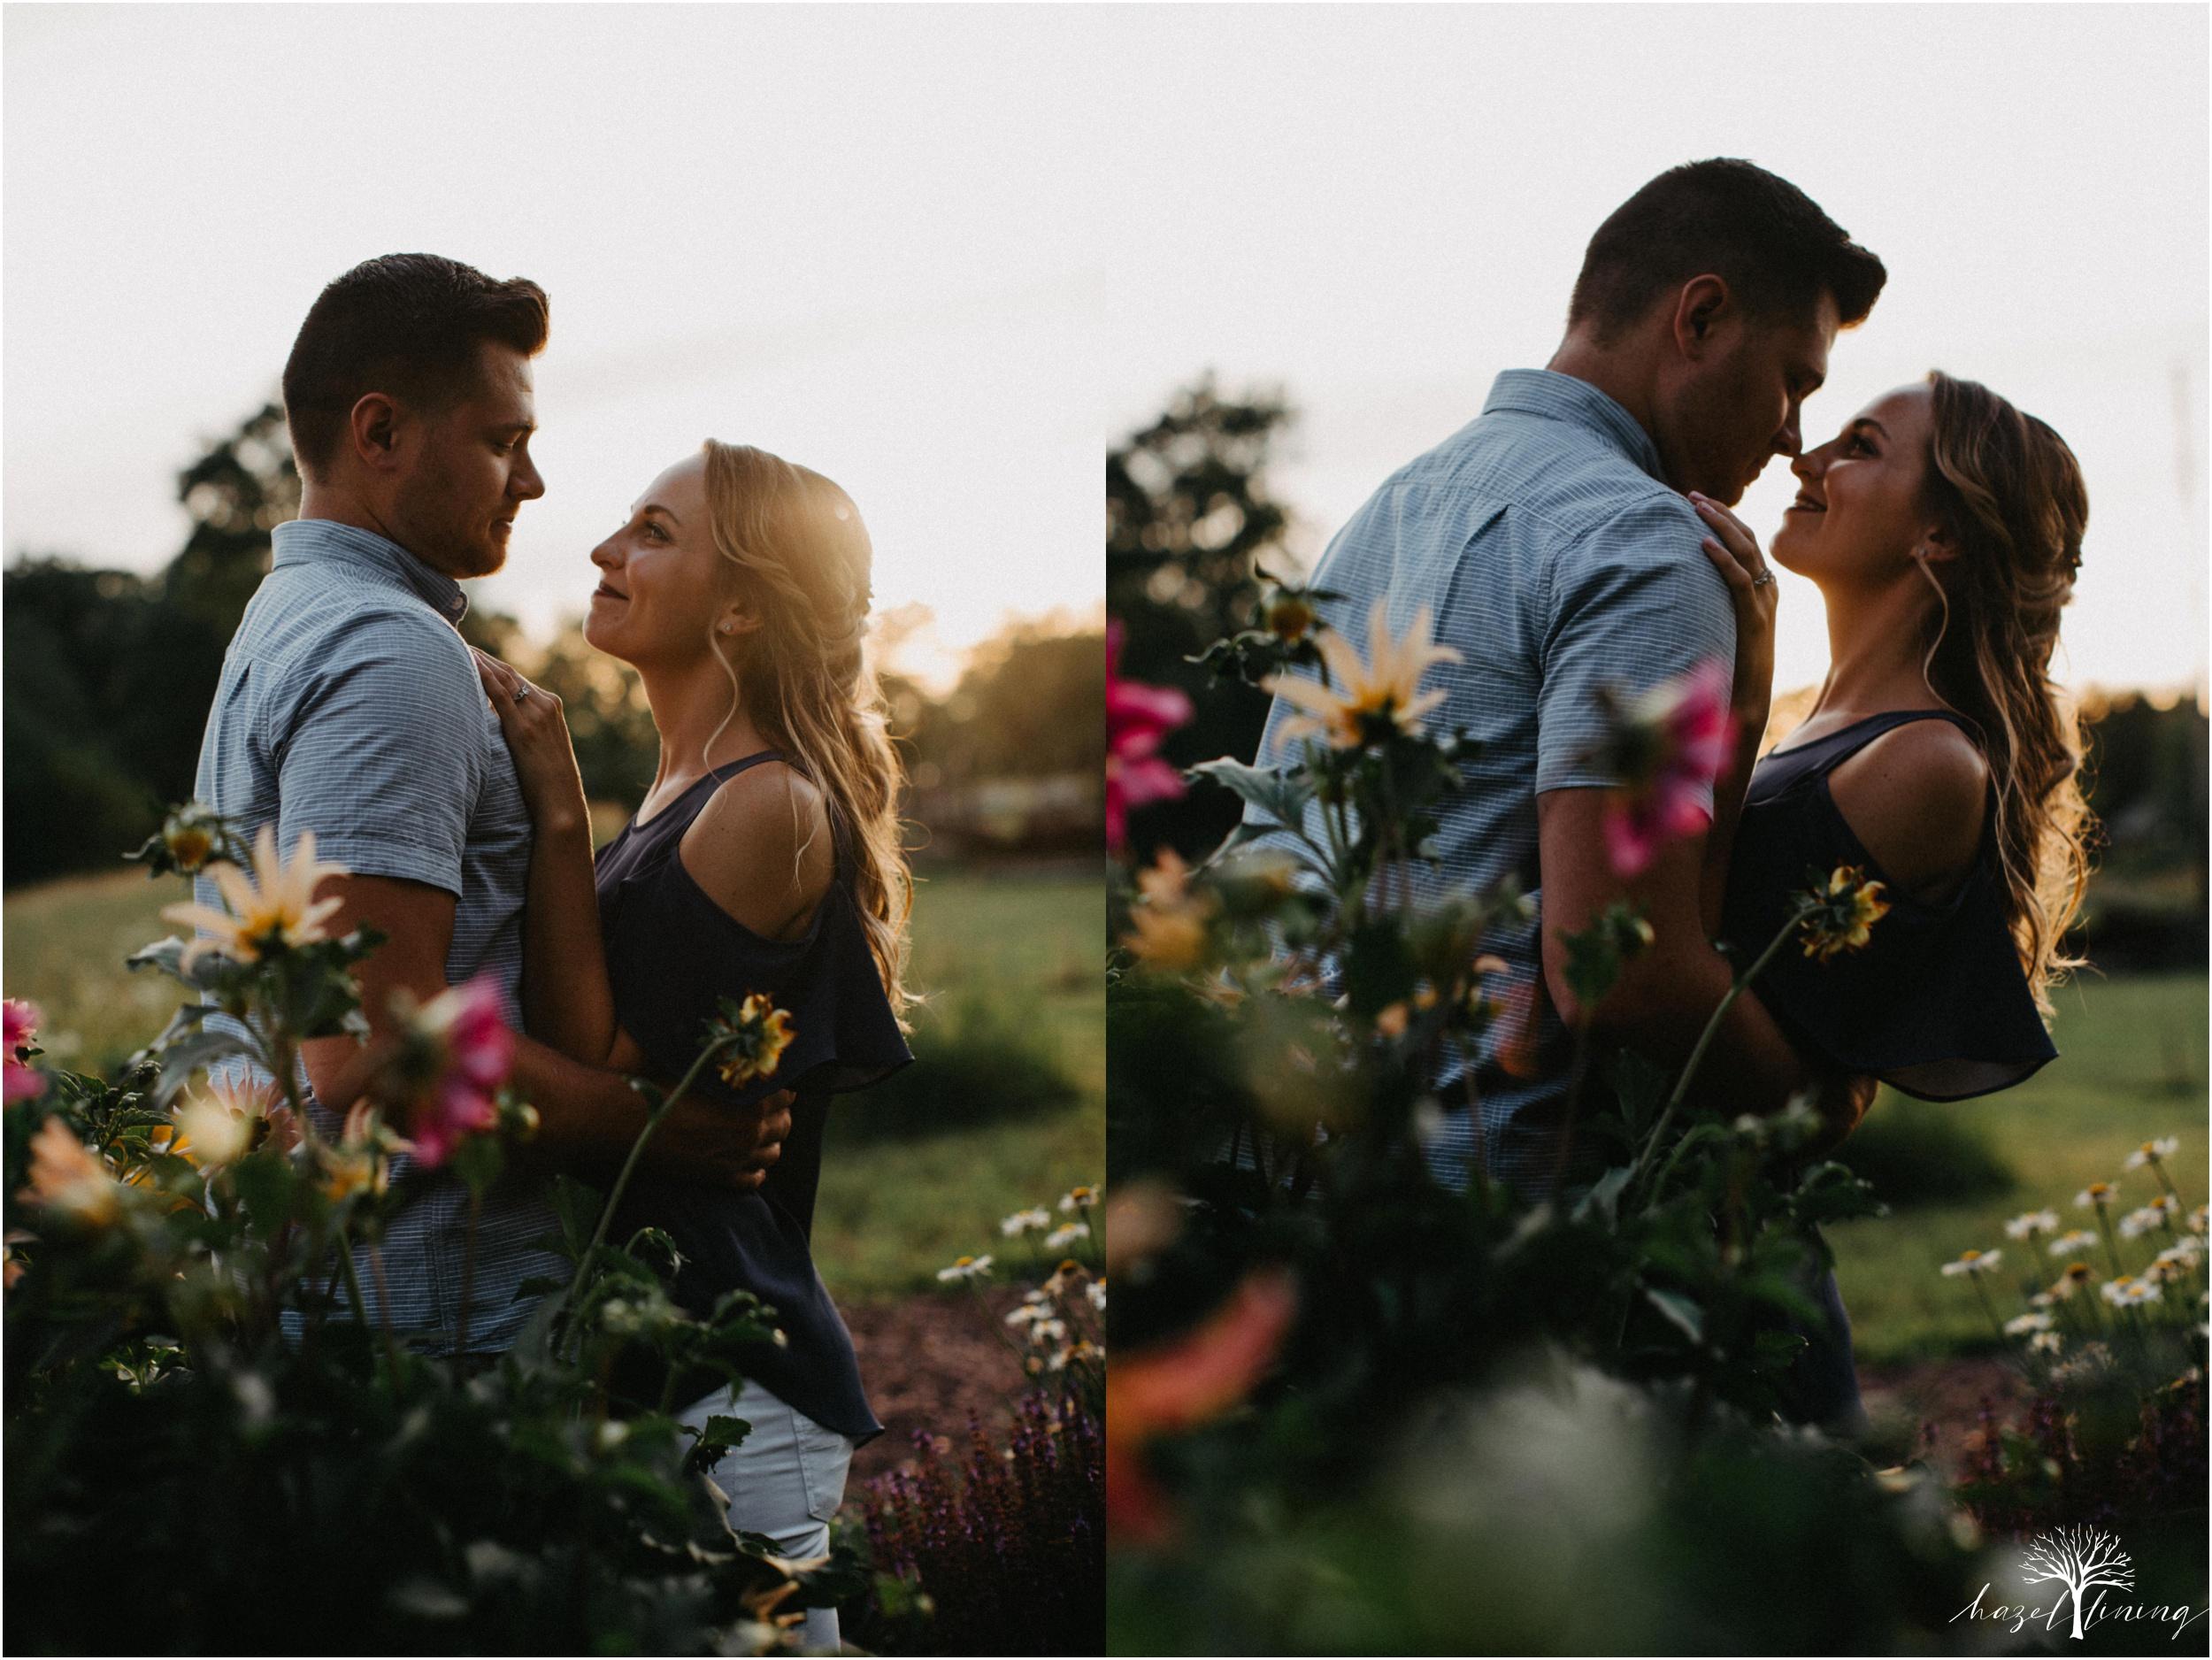 rachel-warner-chris-niedrist-the-farm-bakery-and-events-quakertown-pa-summer-engagement-hazel-lining-photography-destination-elopement-wedding-engagement-photography_0054.jpg